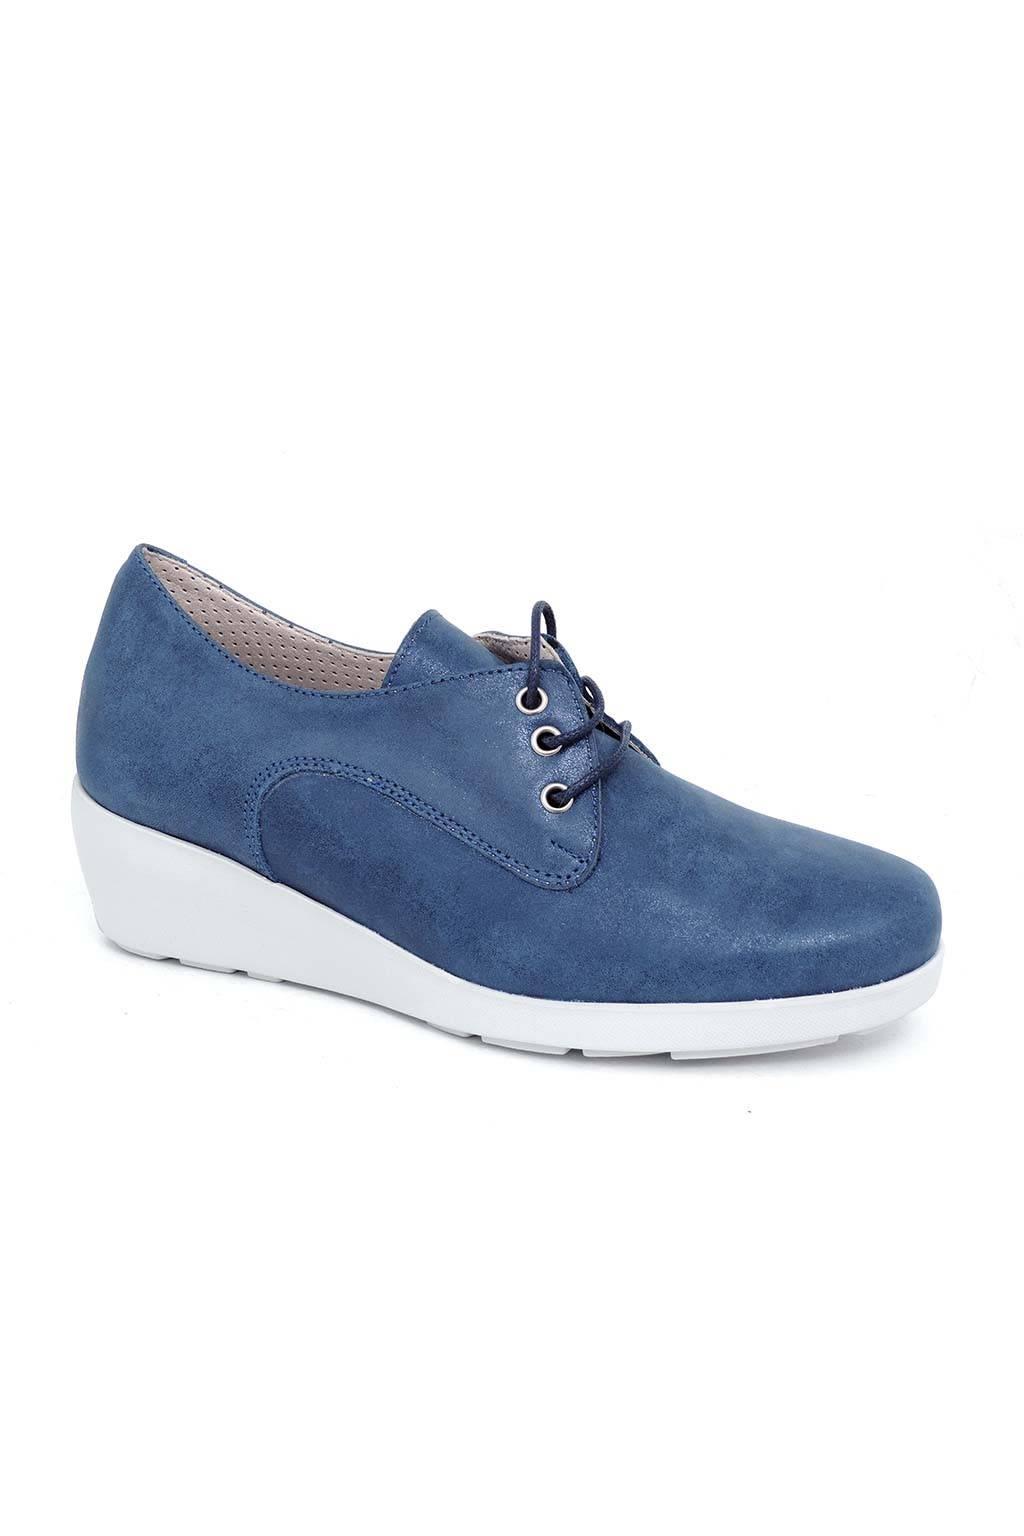 Nature 3958 blue